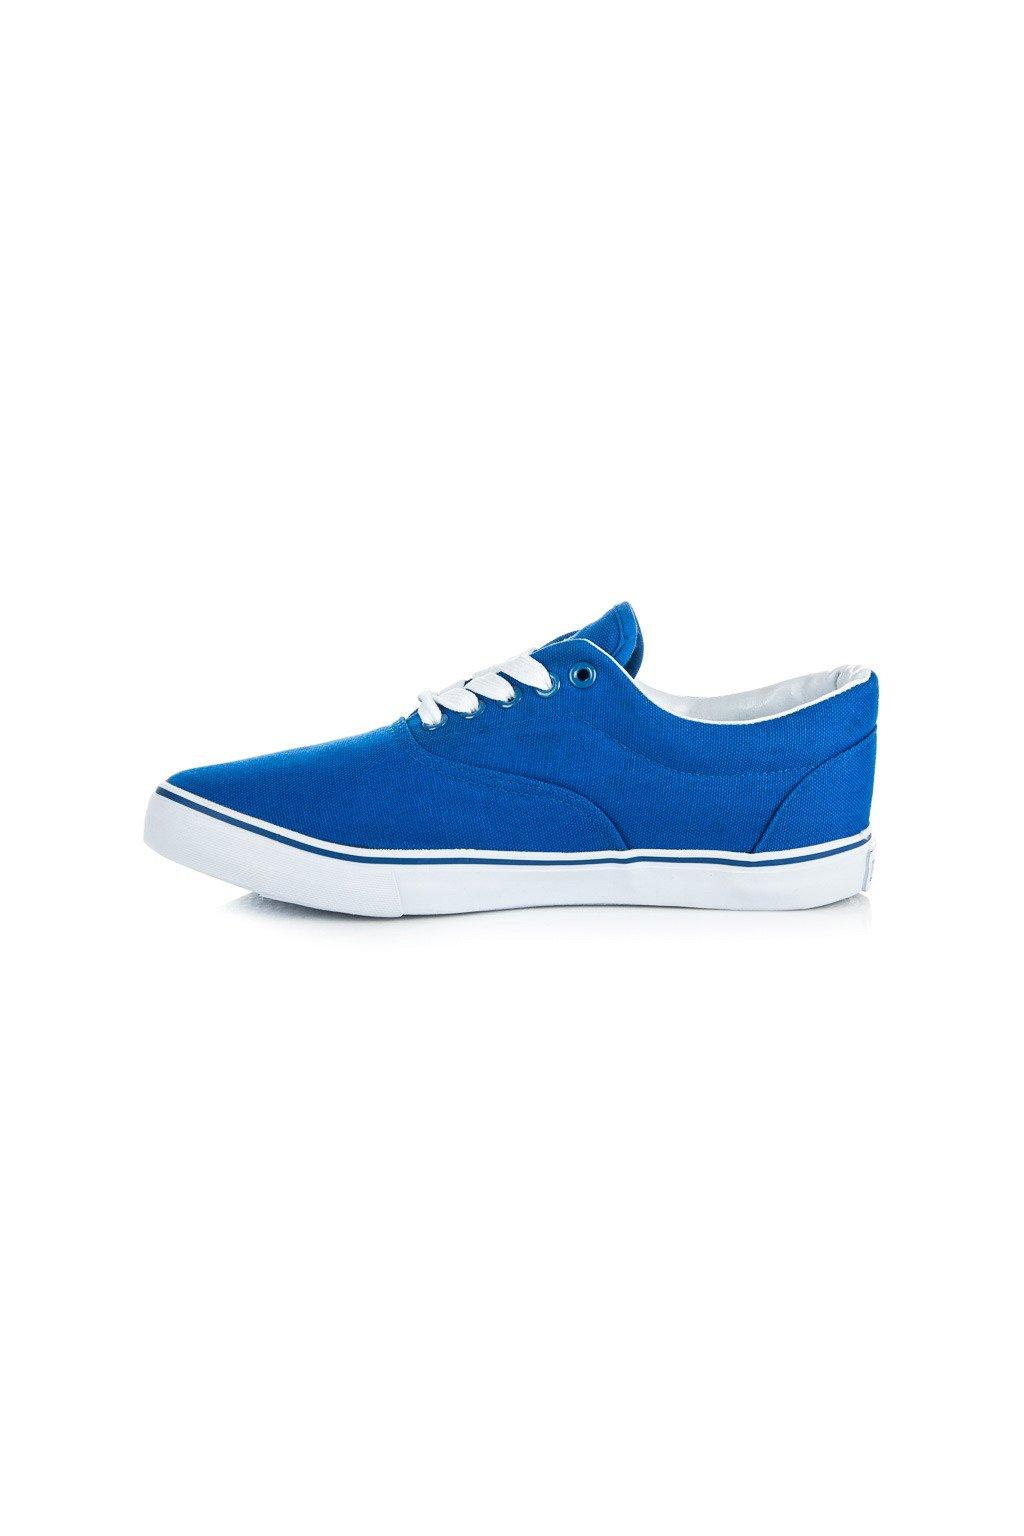 Plátené tenisky modré New Age 086BL  6afaa8b6293